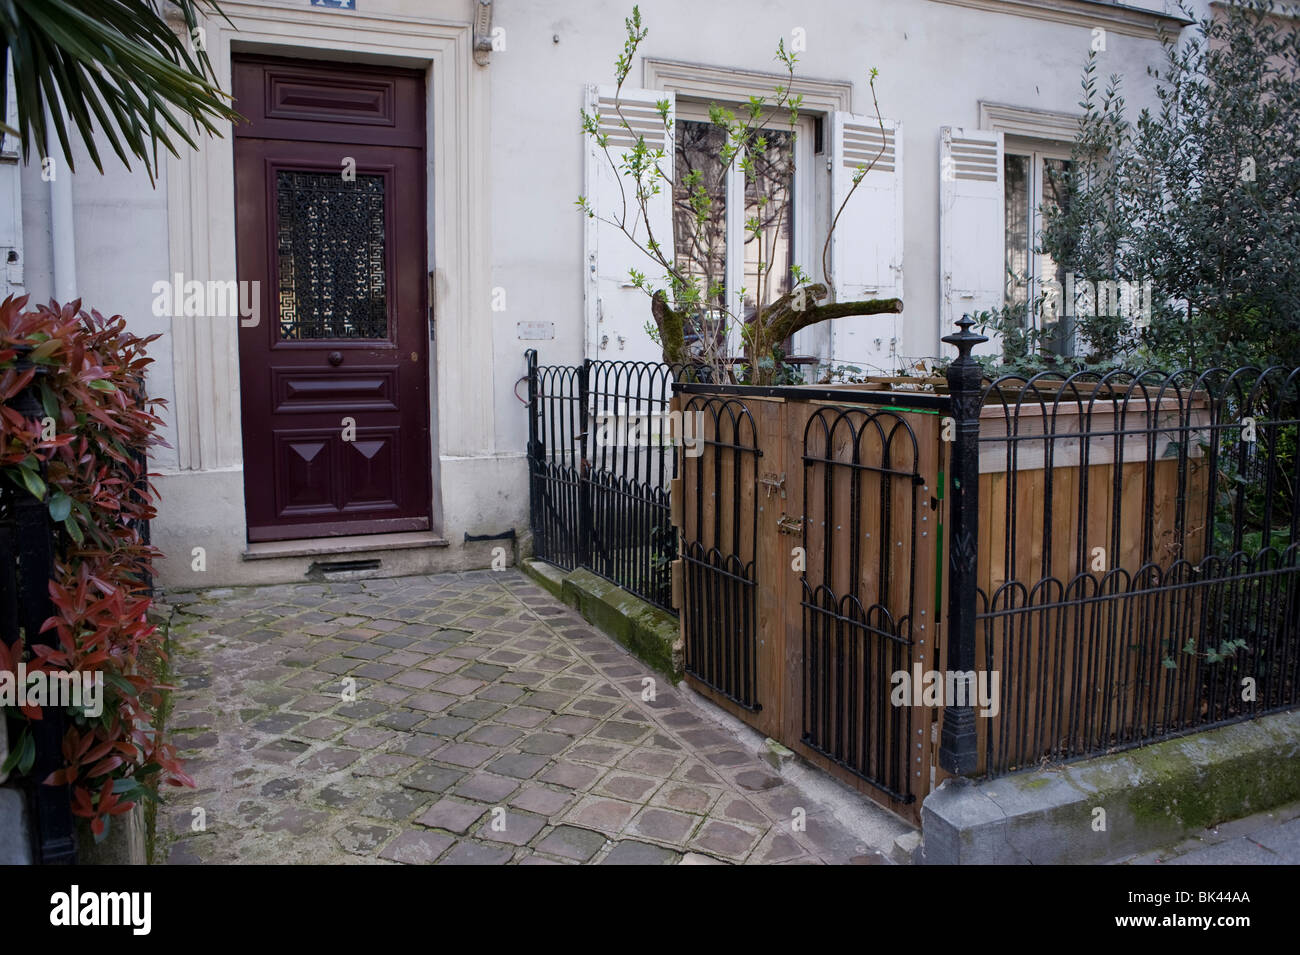 Paris, France, Private Apartment Building Front Entrance Door, with ...